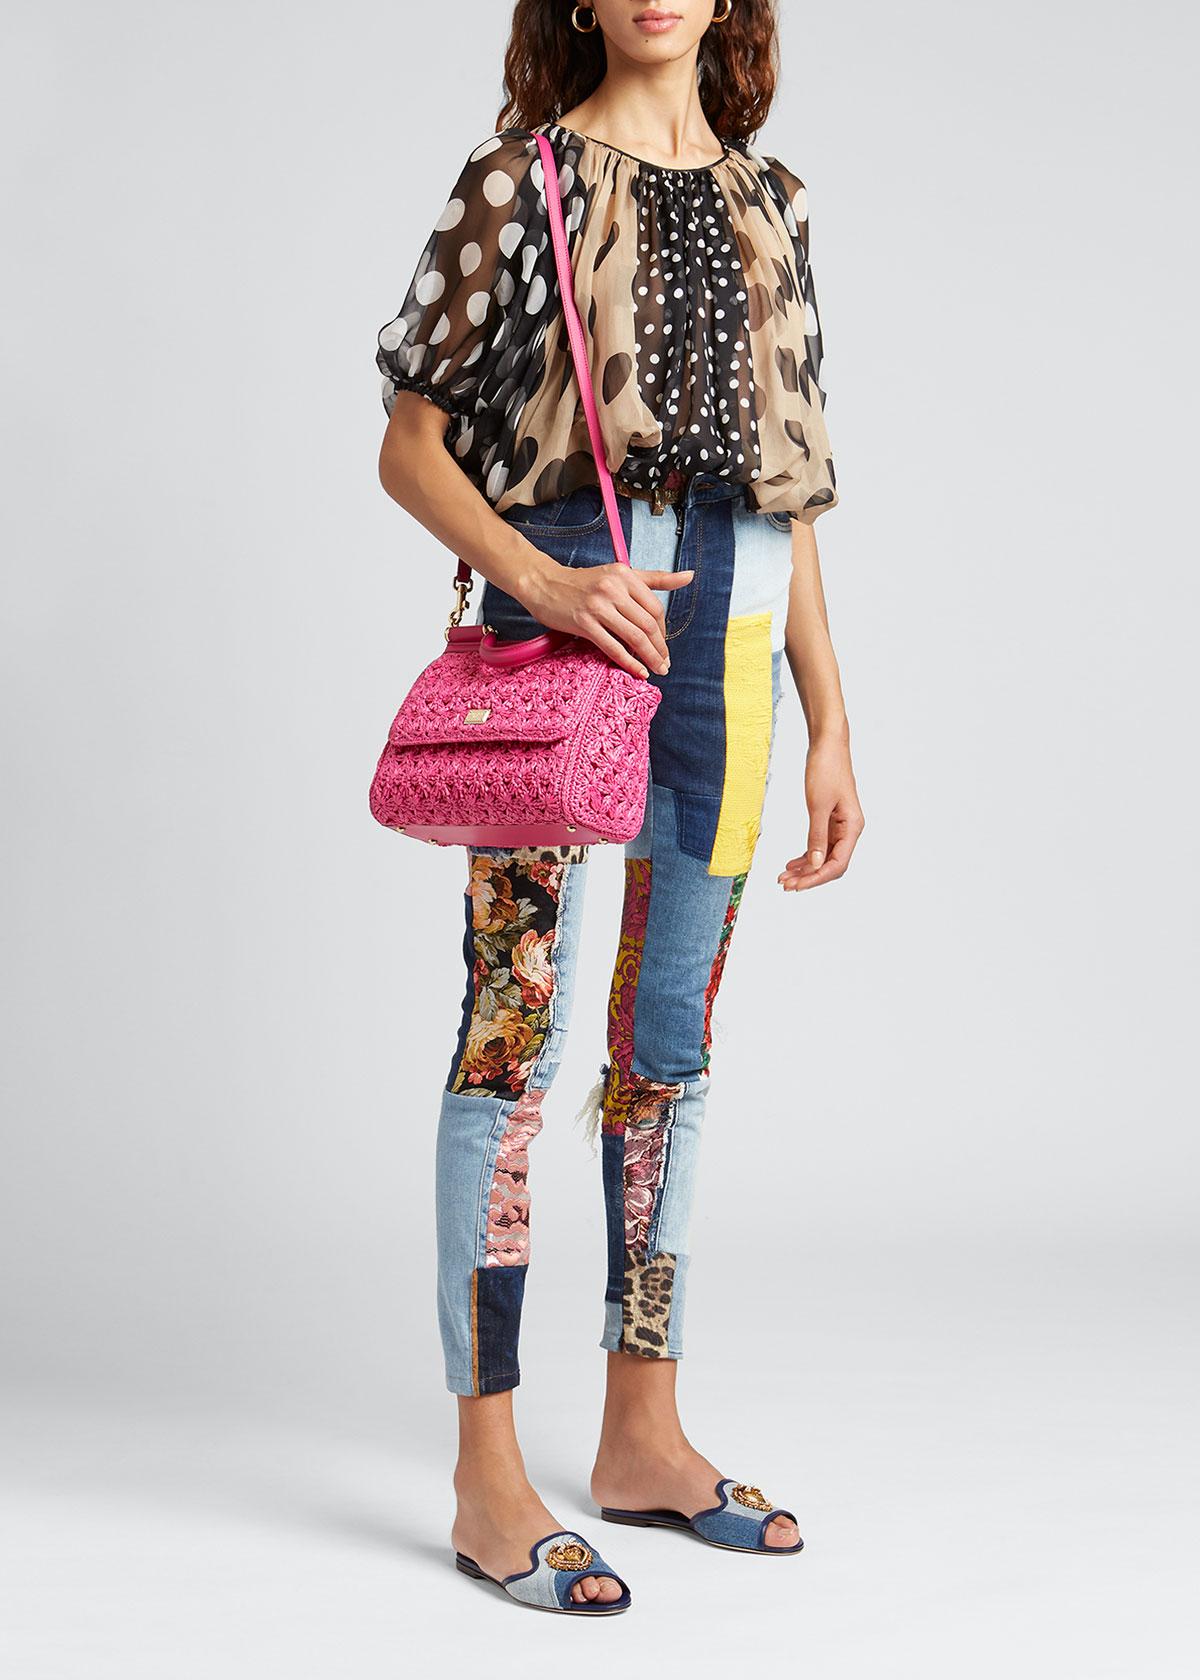 Dolce & Gabbana DESTROYED PATCHWORK SKINNY JEANS